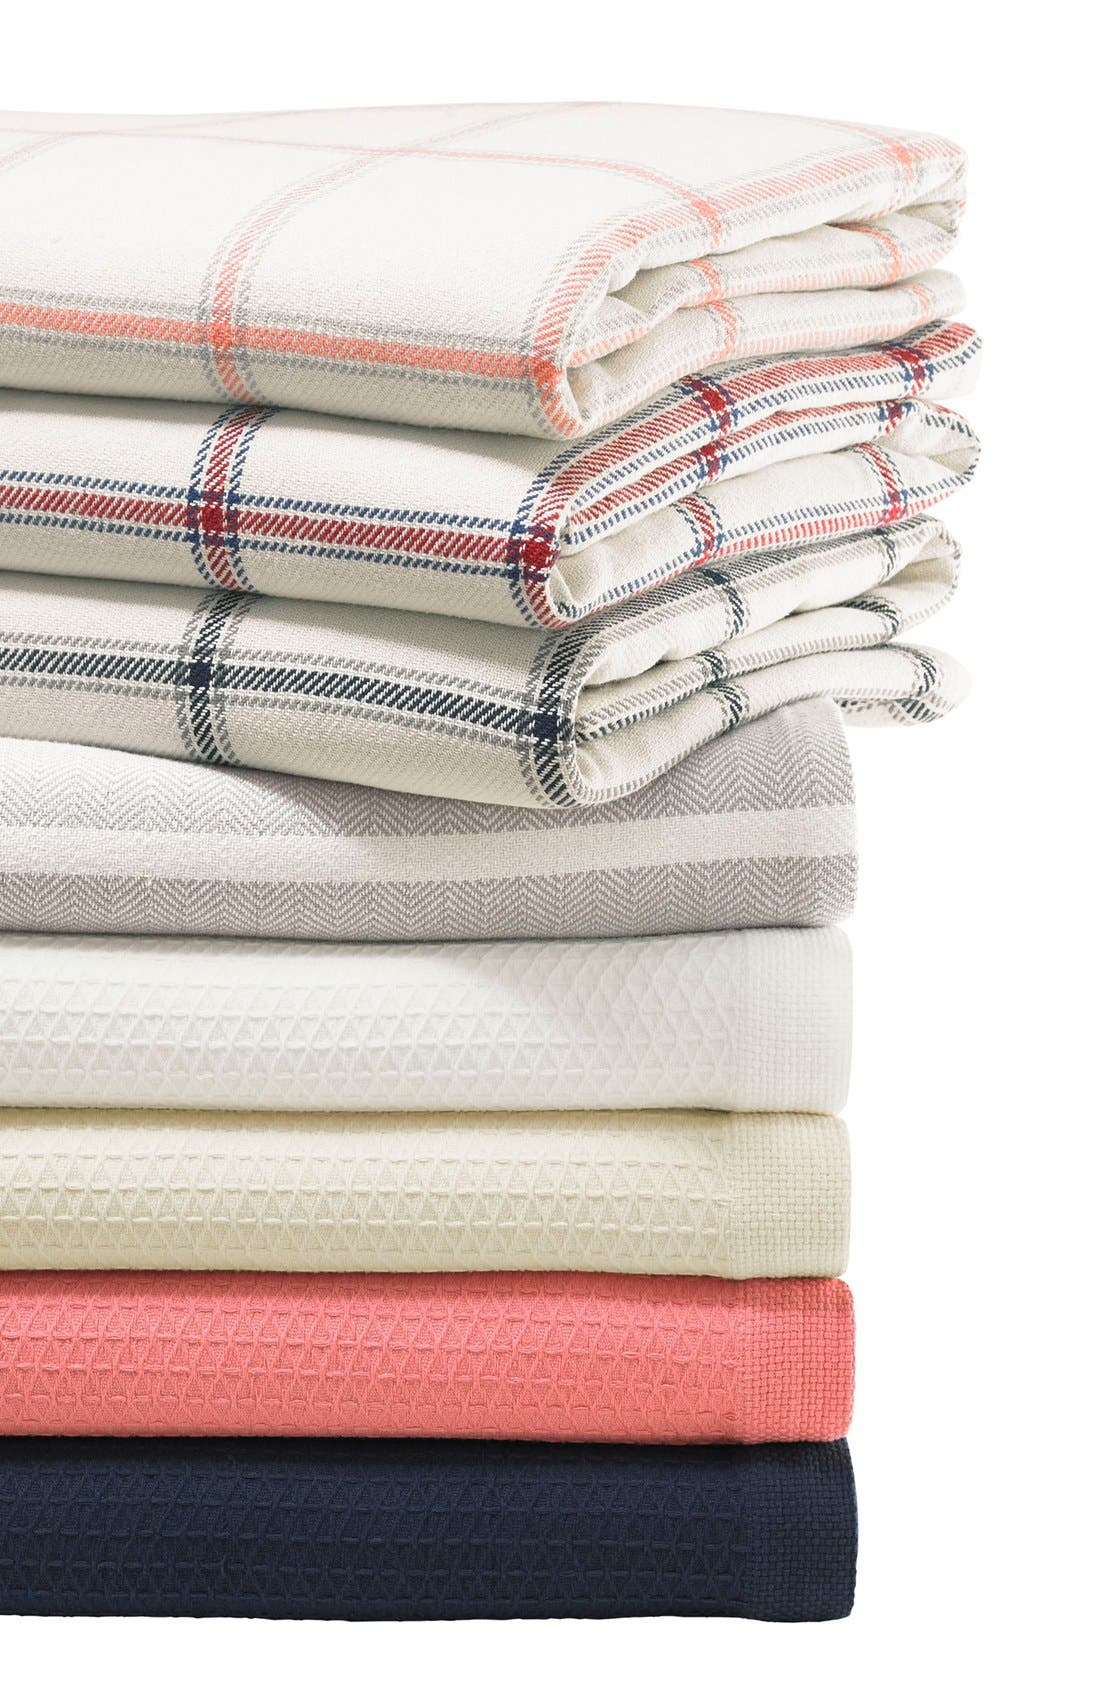 'Baird' Cotton Blanket,                             Alternate thumbnail 3, color,